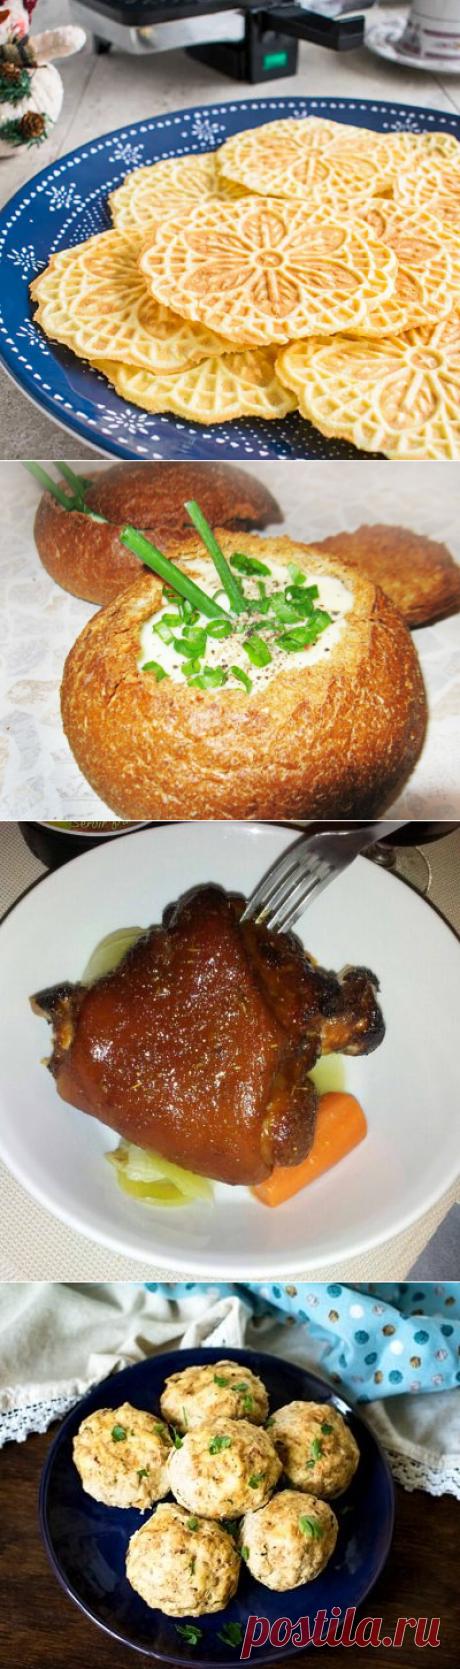 Чешская кухня - традиционные рецепты